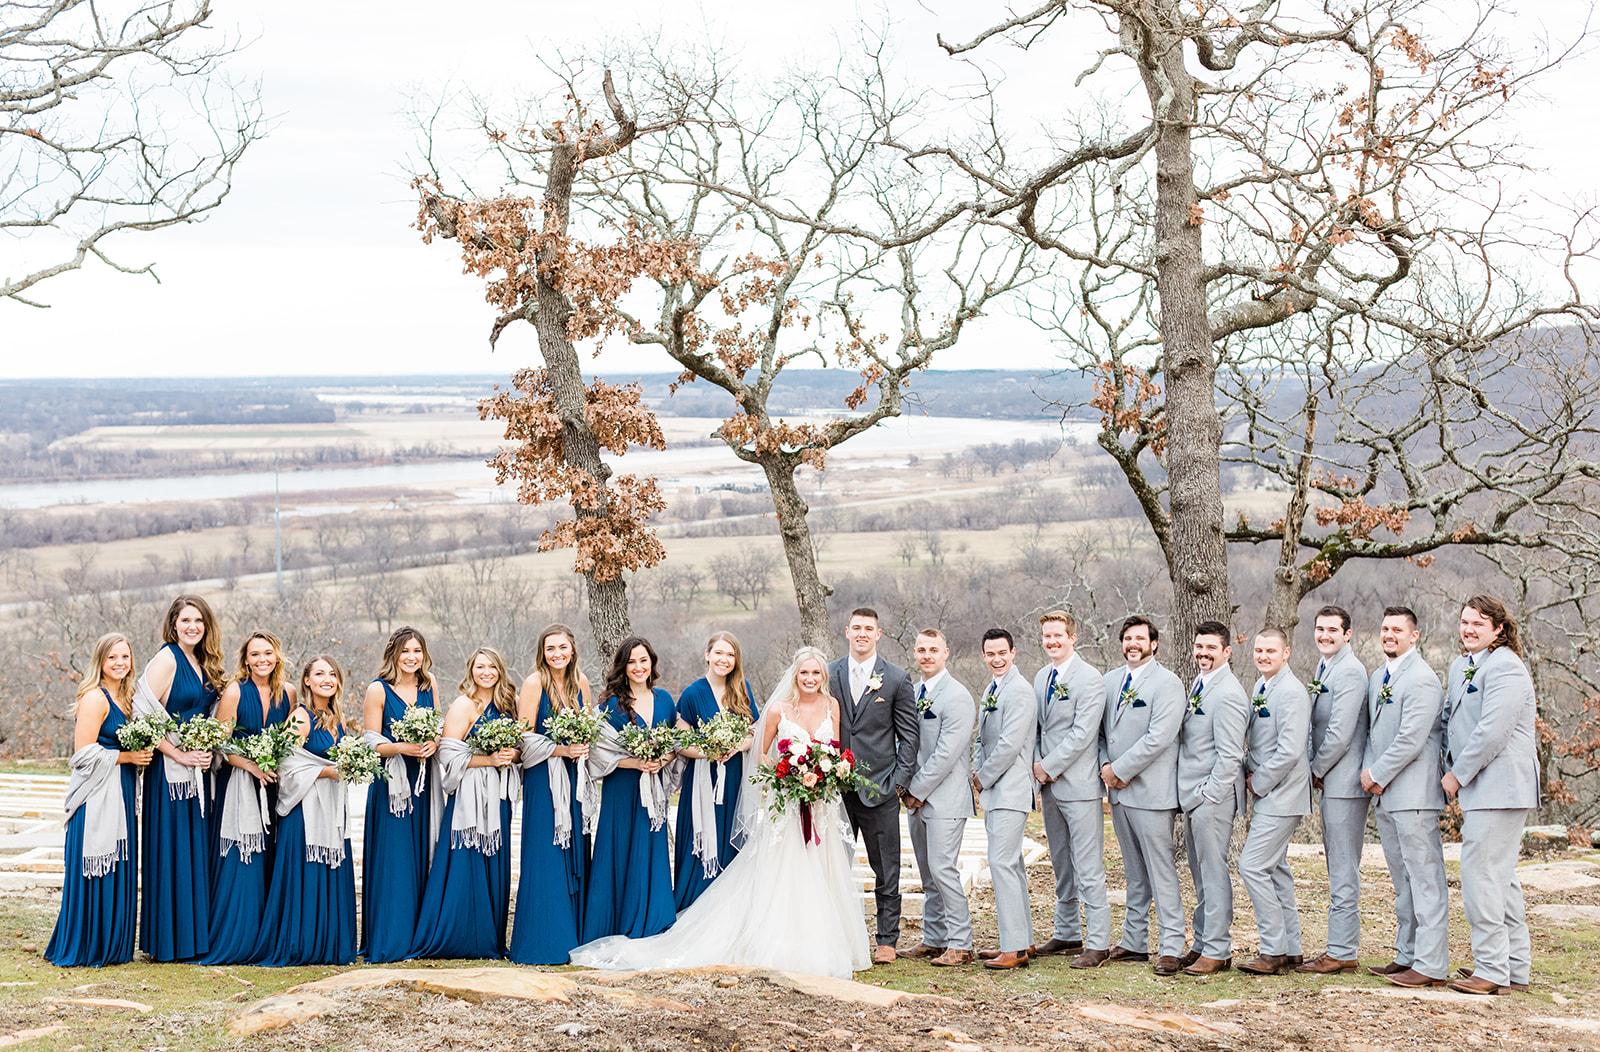 Bixby Tulsa Wedding Venues 25a.jpg